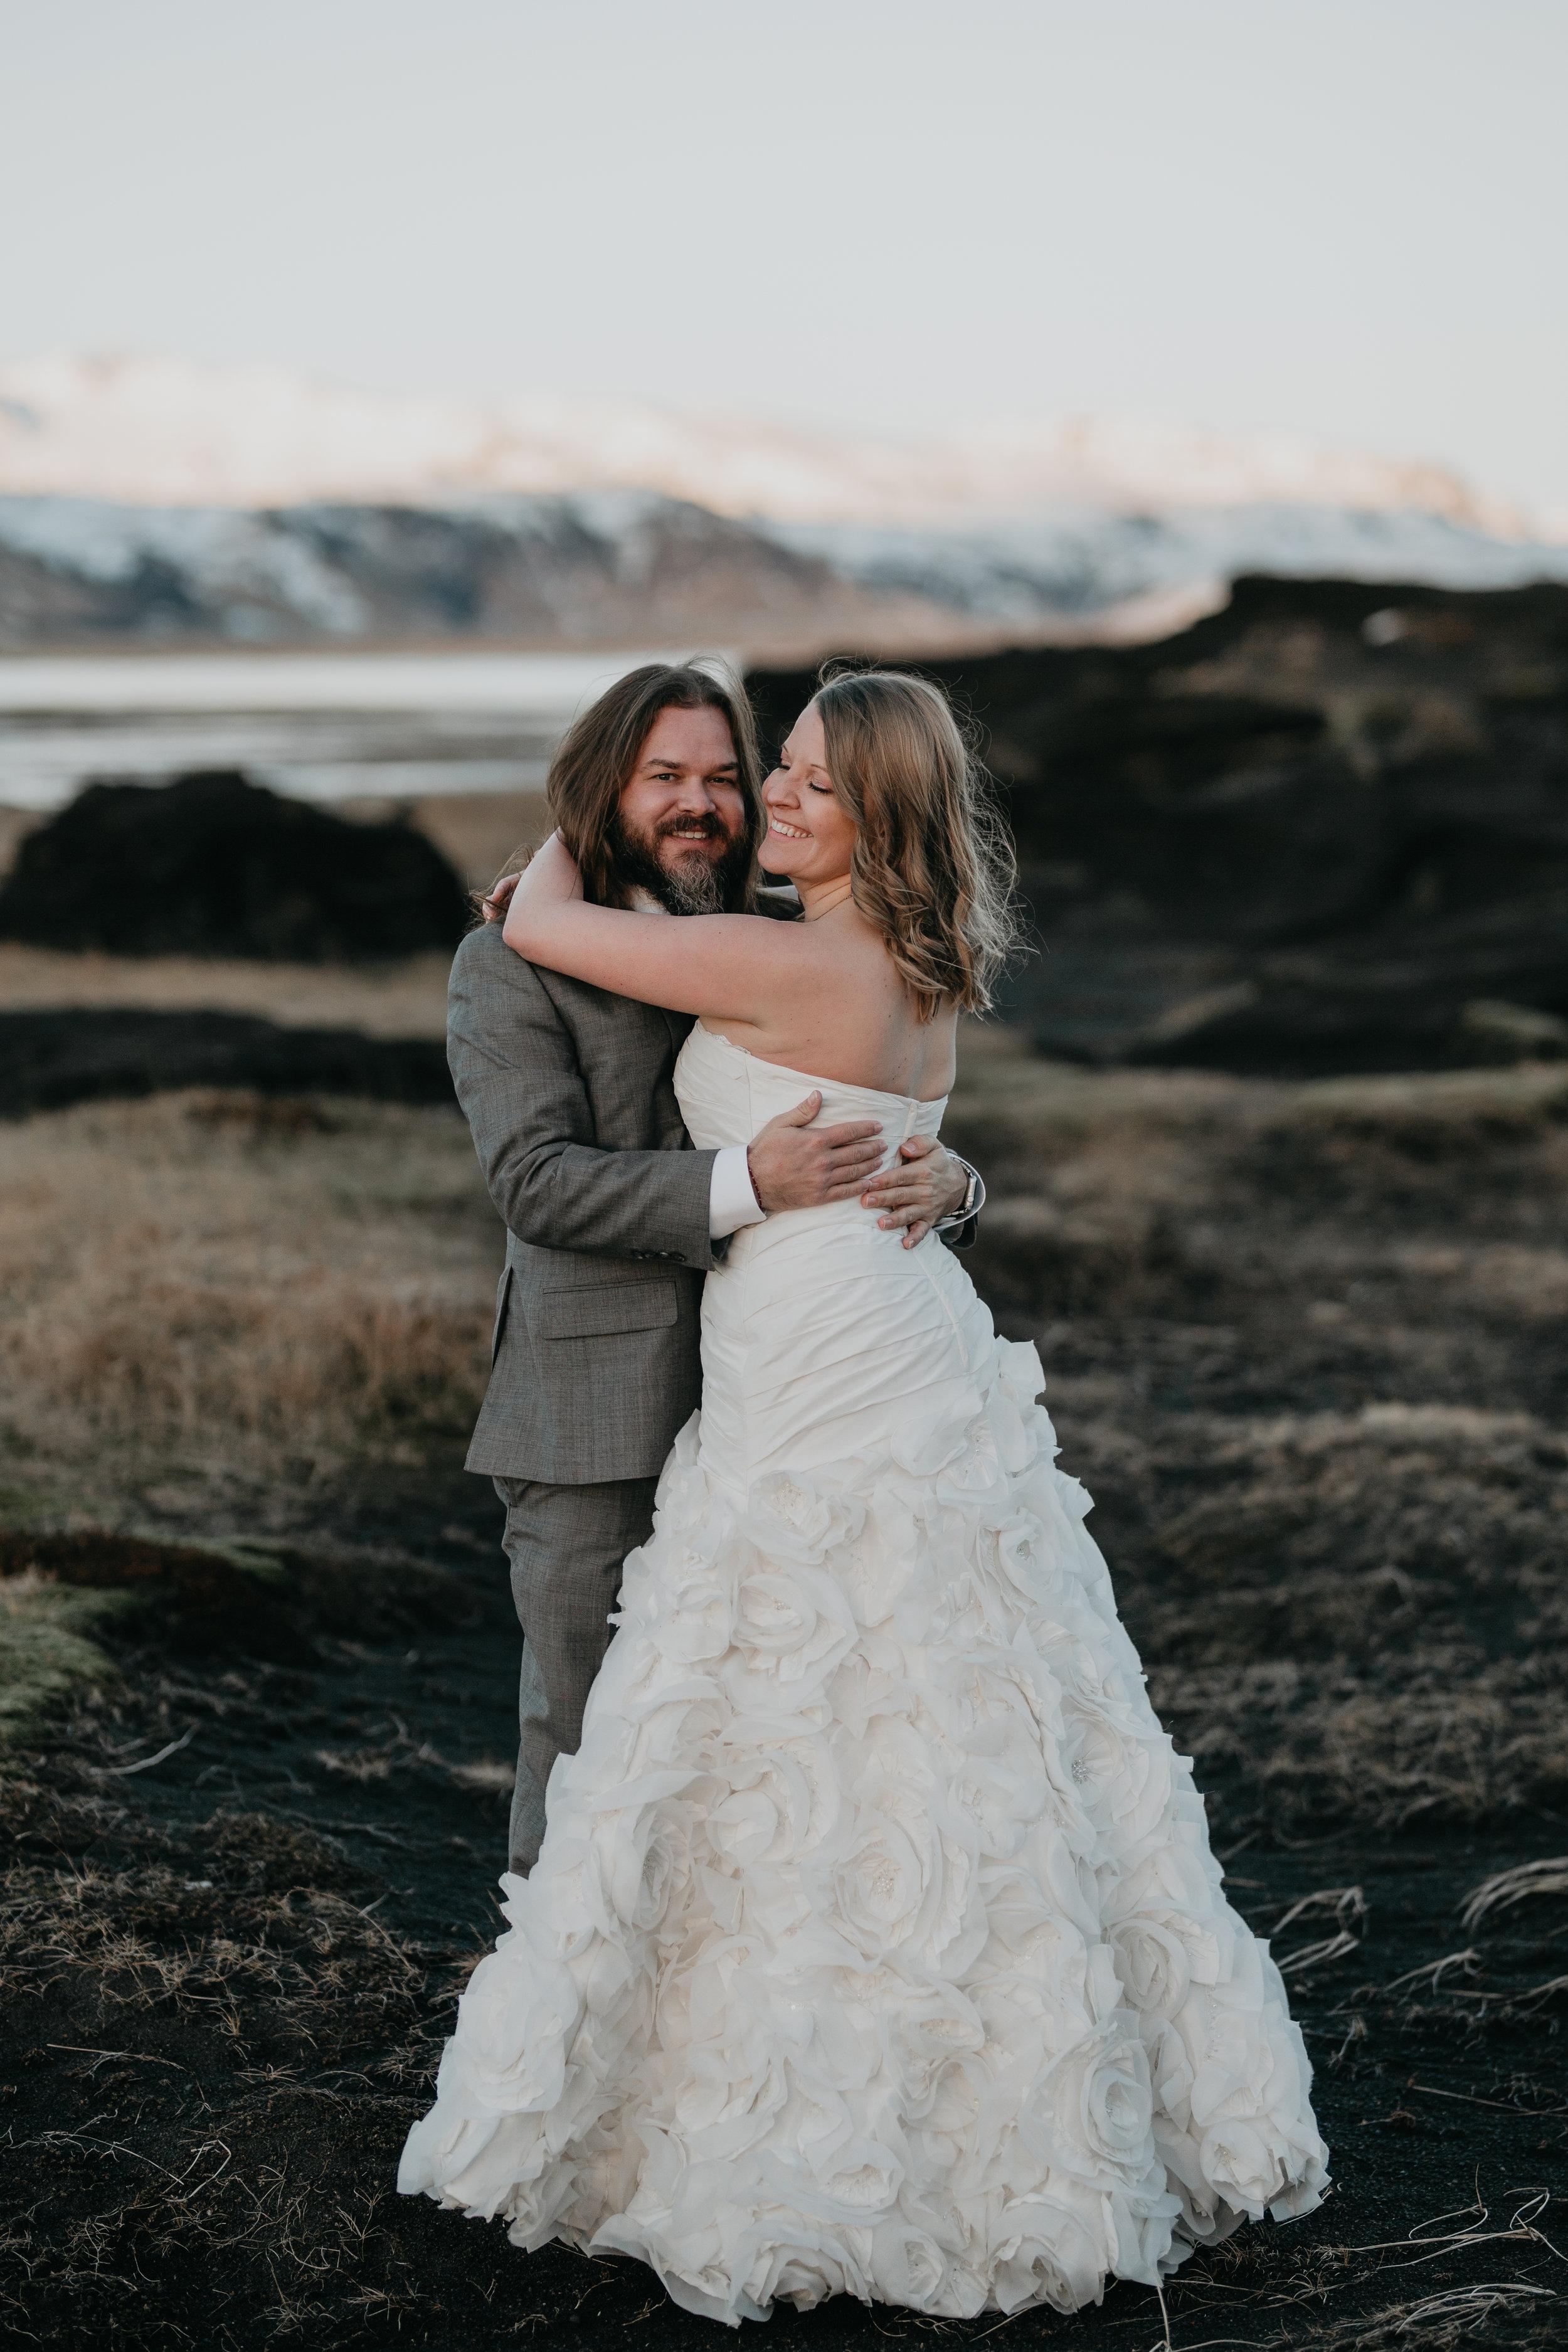 nicole-daacke-photography-iceland-winter-sunset-adventure-elopement-skogafoss-waterfall-black-sand-beach-dyrholaey-vik-iceland-intimate-wedding-black-church-elopement-photographer-30.jpg